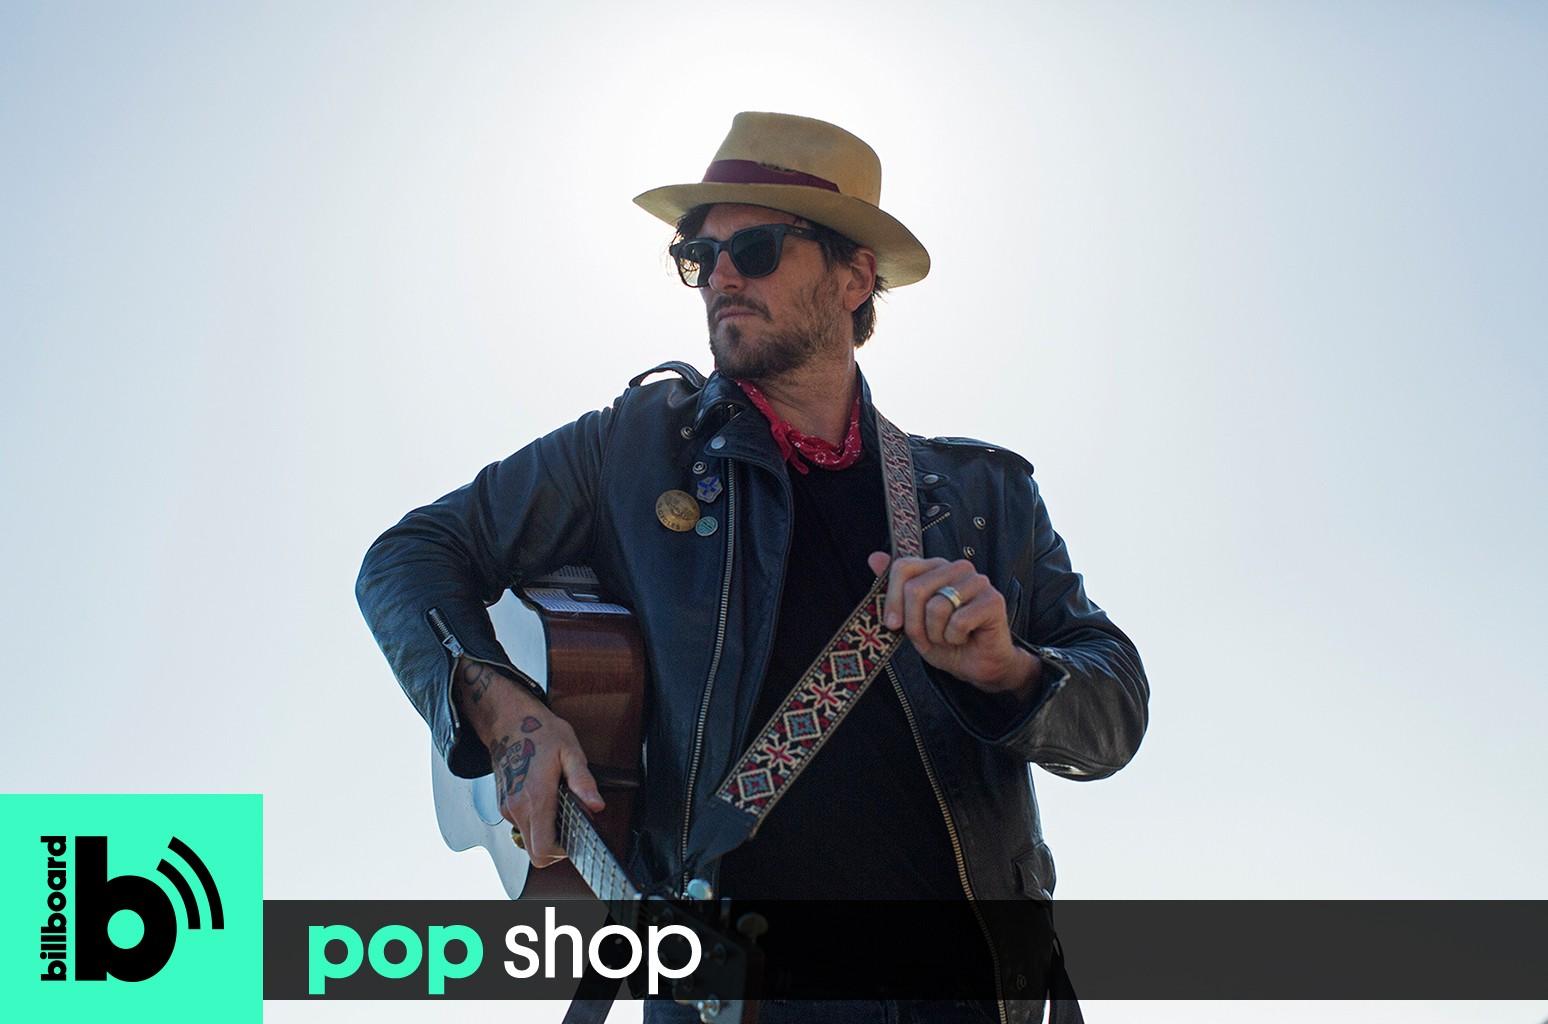 Pop Shop Podcast featuring: Butch Walker